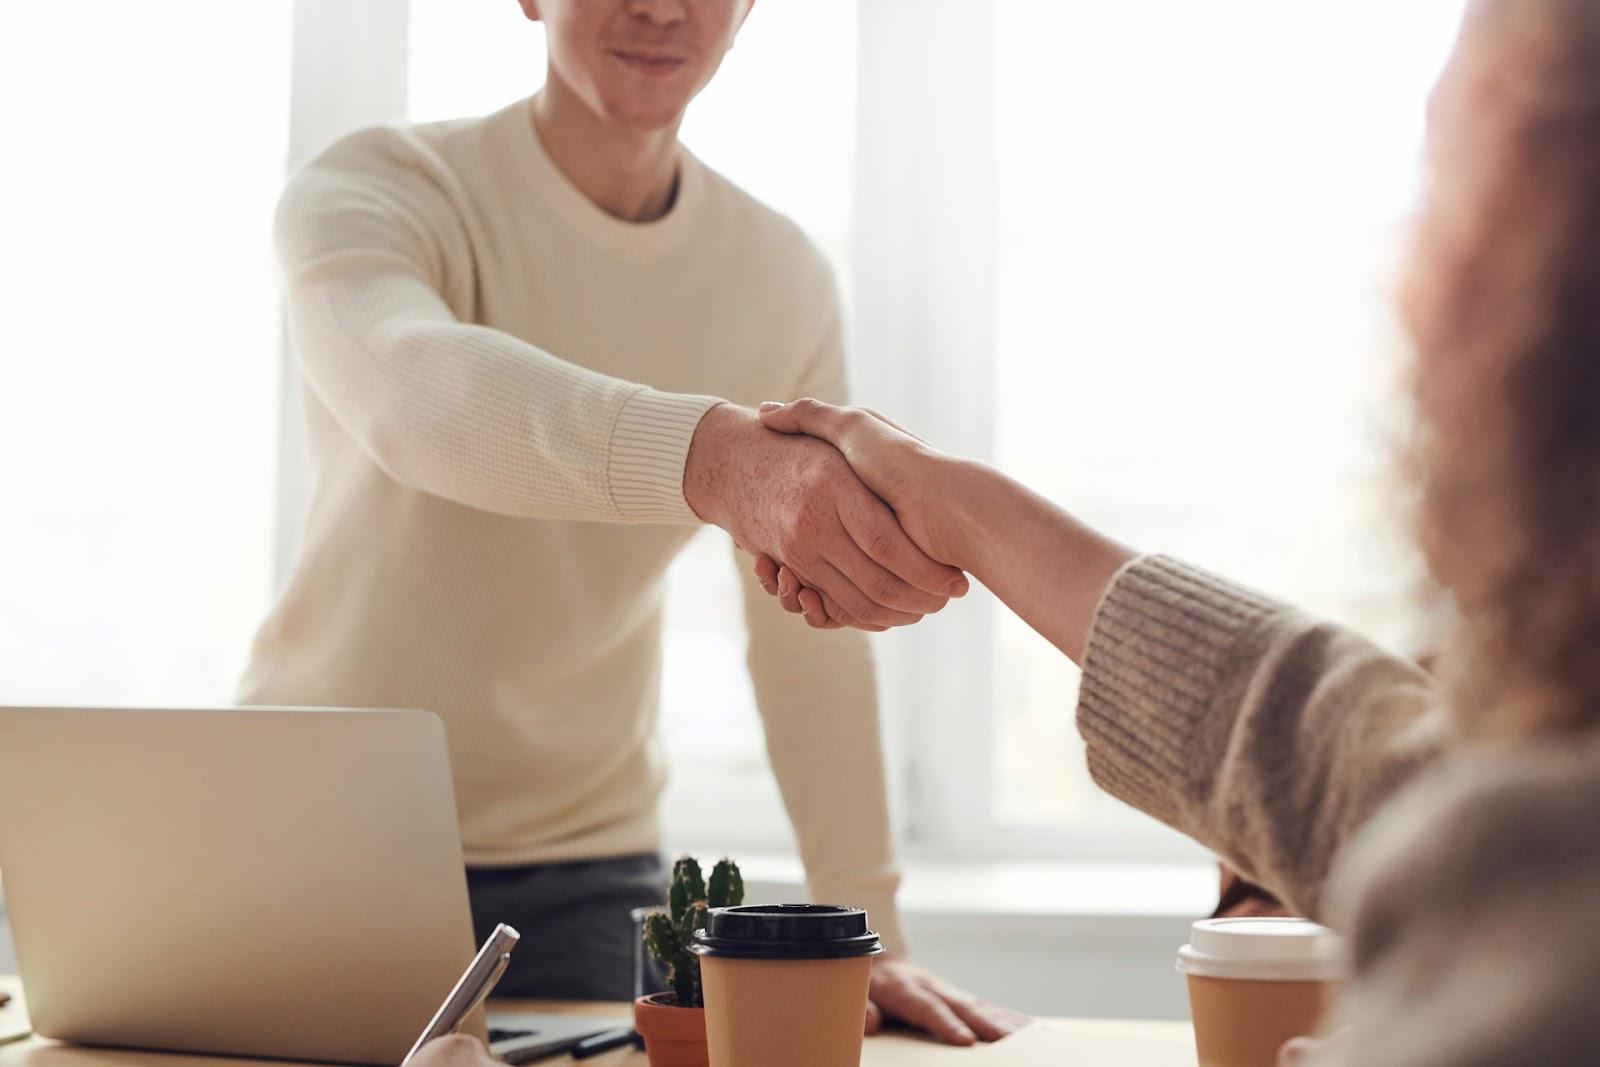 Helps you close high-value deals